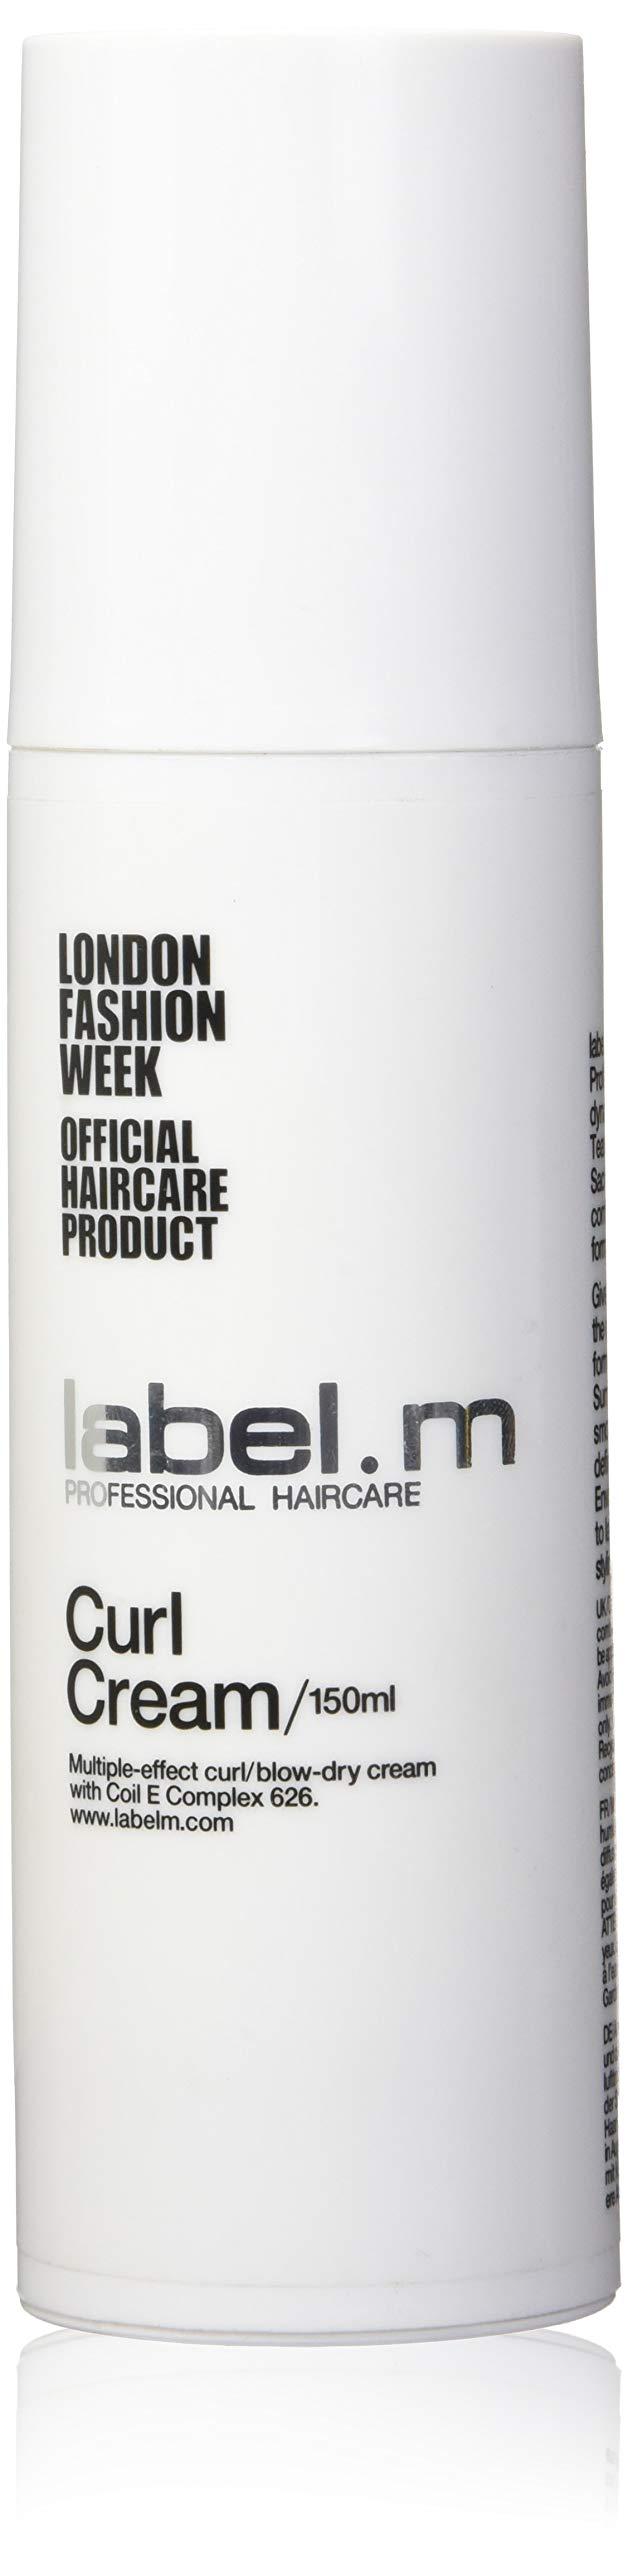 Label M Curl Cream 150 ml by Label M